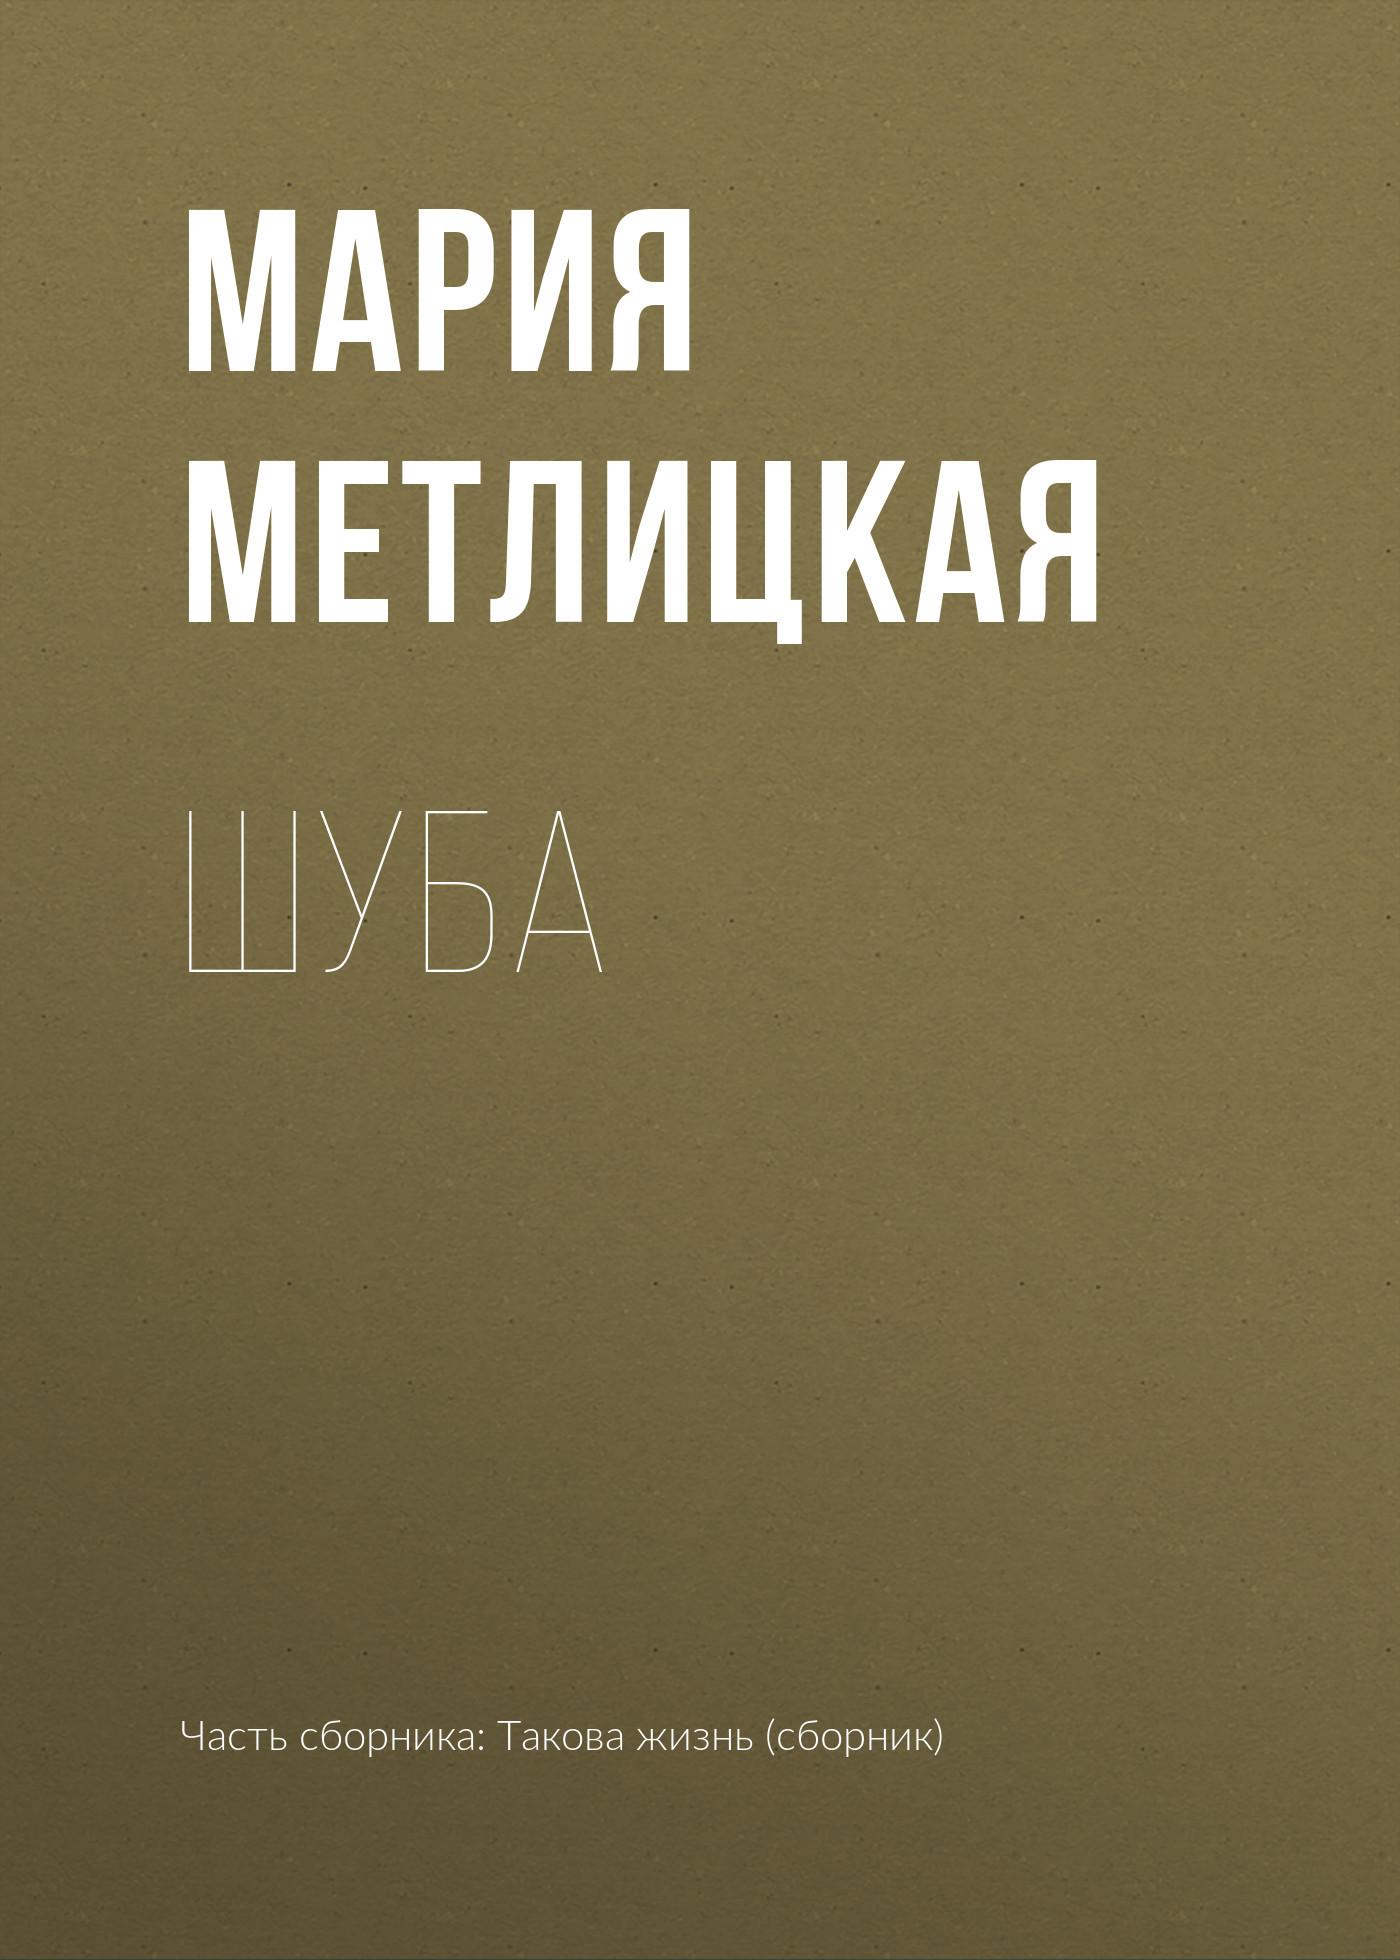 Мария Метлицкая Шуба